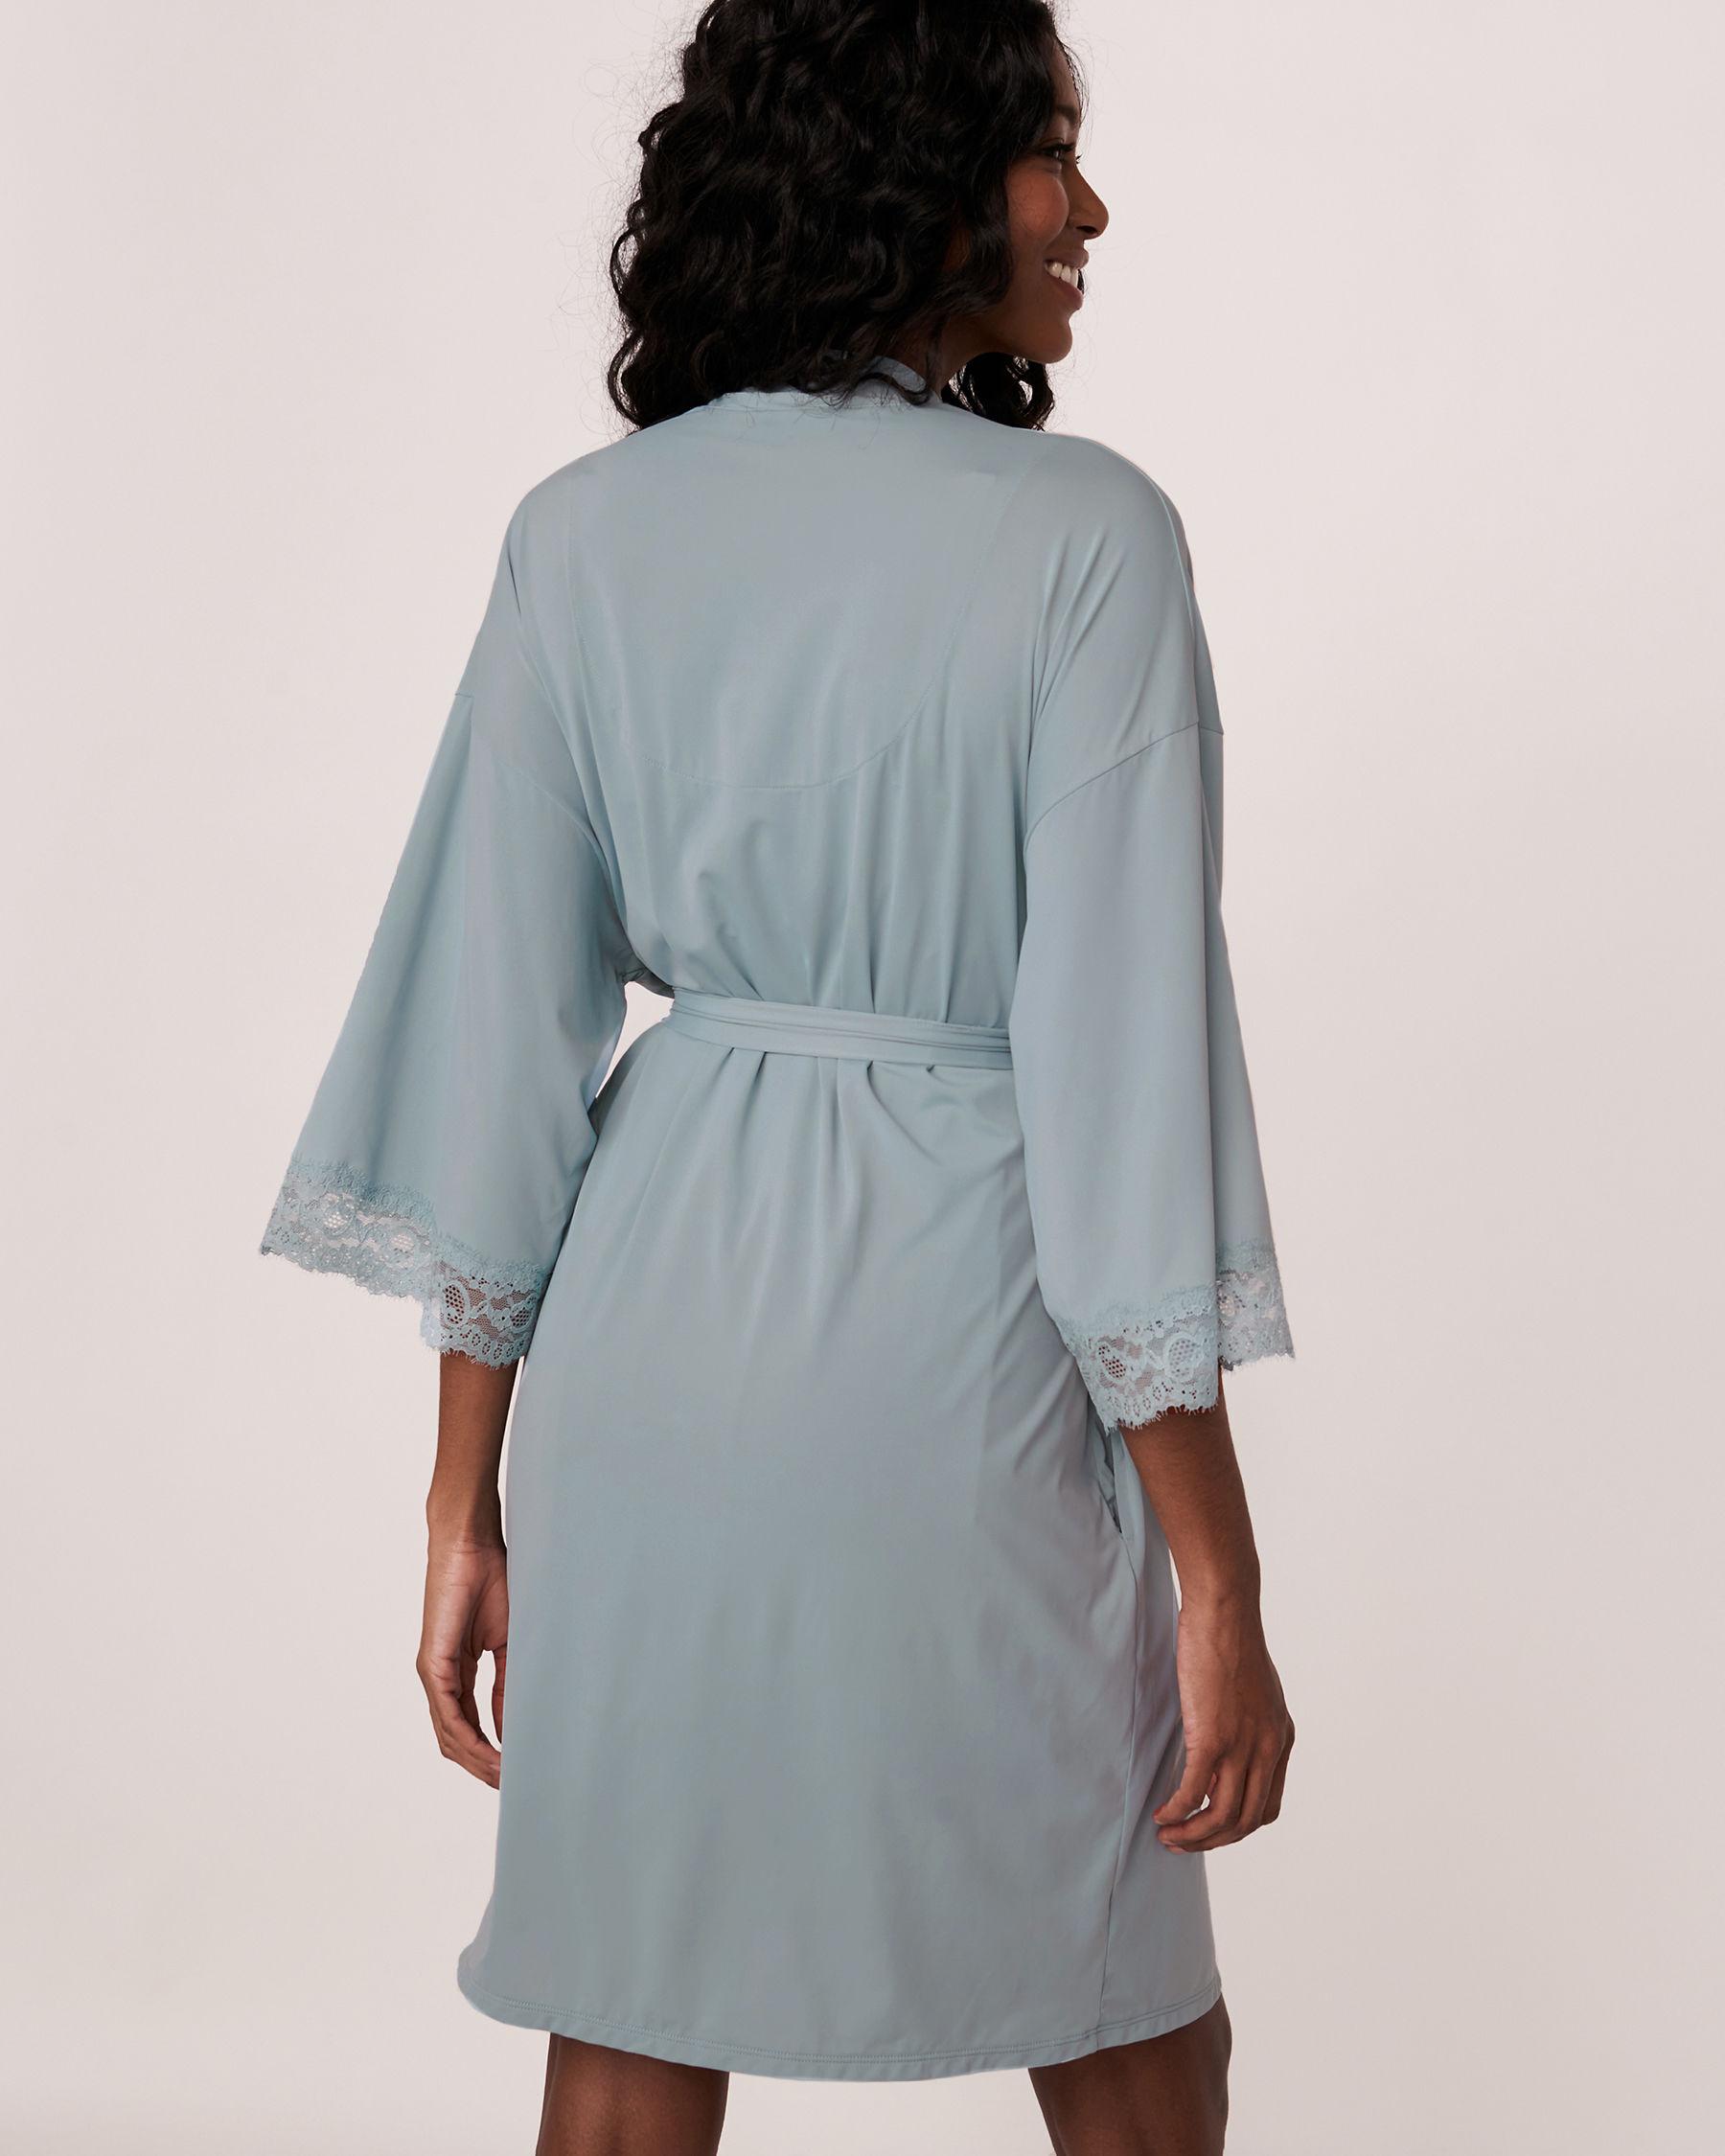 LA VIE EN ROSE Kimono garniture de dentelle Bleu gris 60600001 - Voir5